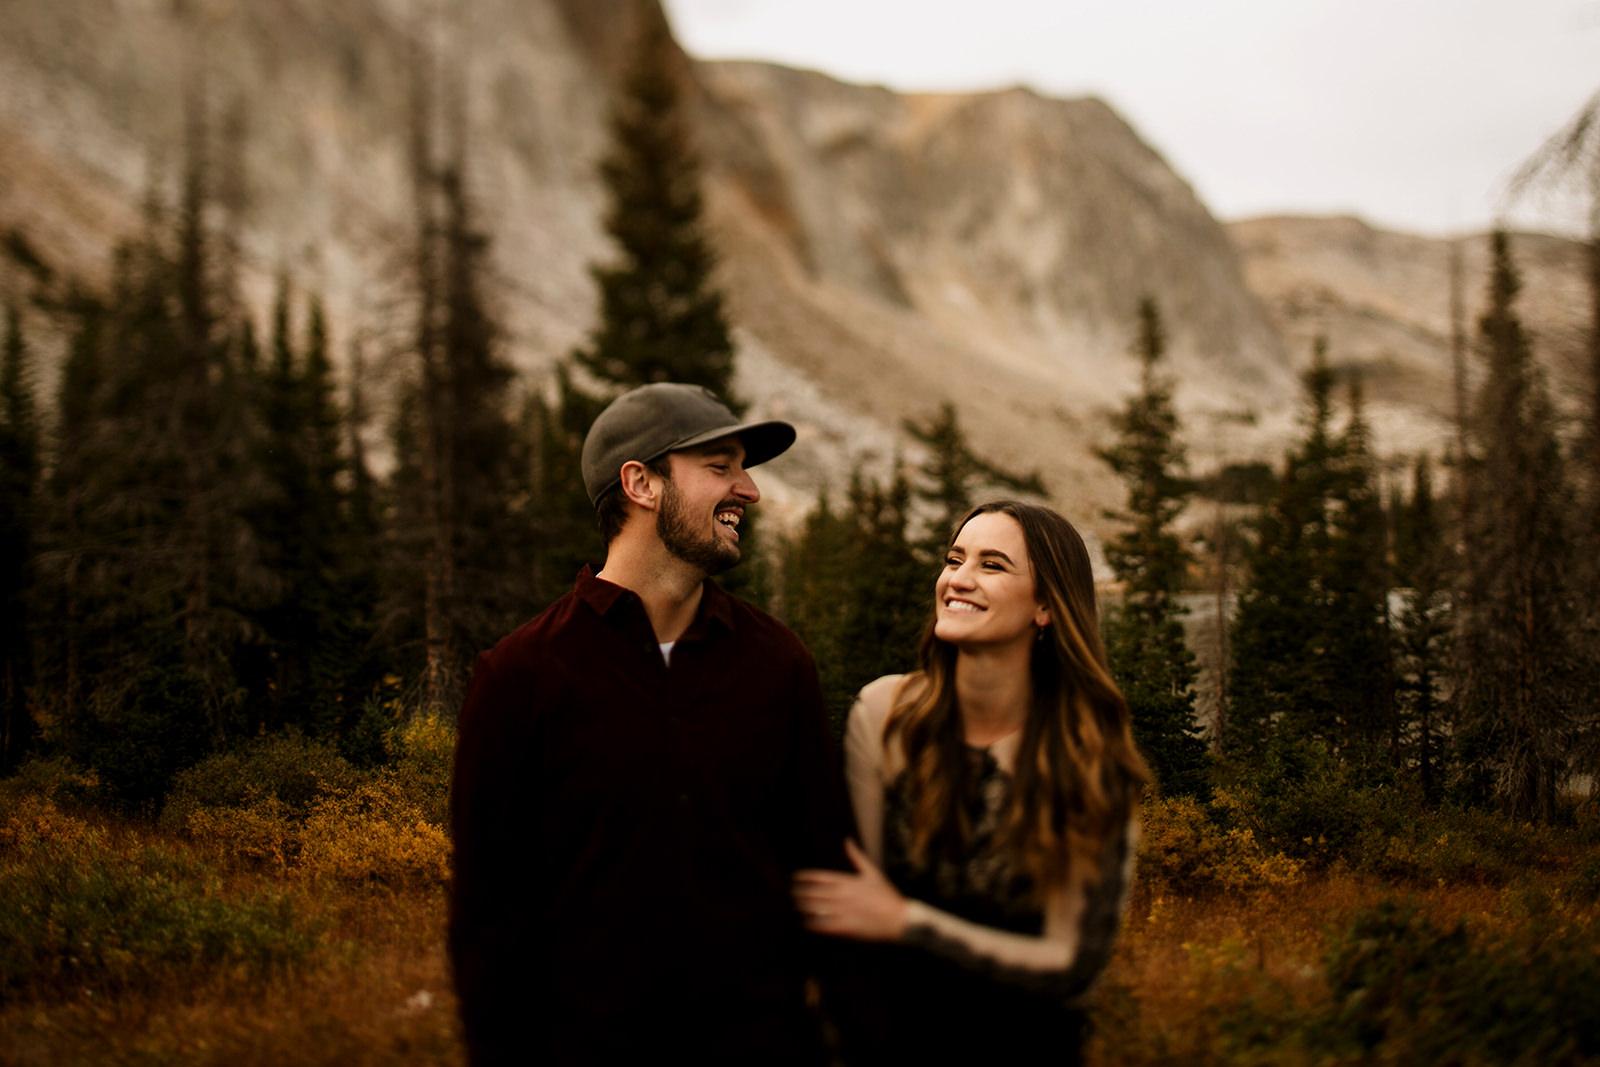 Liz Osban Photography Cheyenne Wyoming Engagement Wedding Photographer couple adventure elopement wedding laramie denver fort collins colorado rocky mountain national park24.jpg